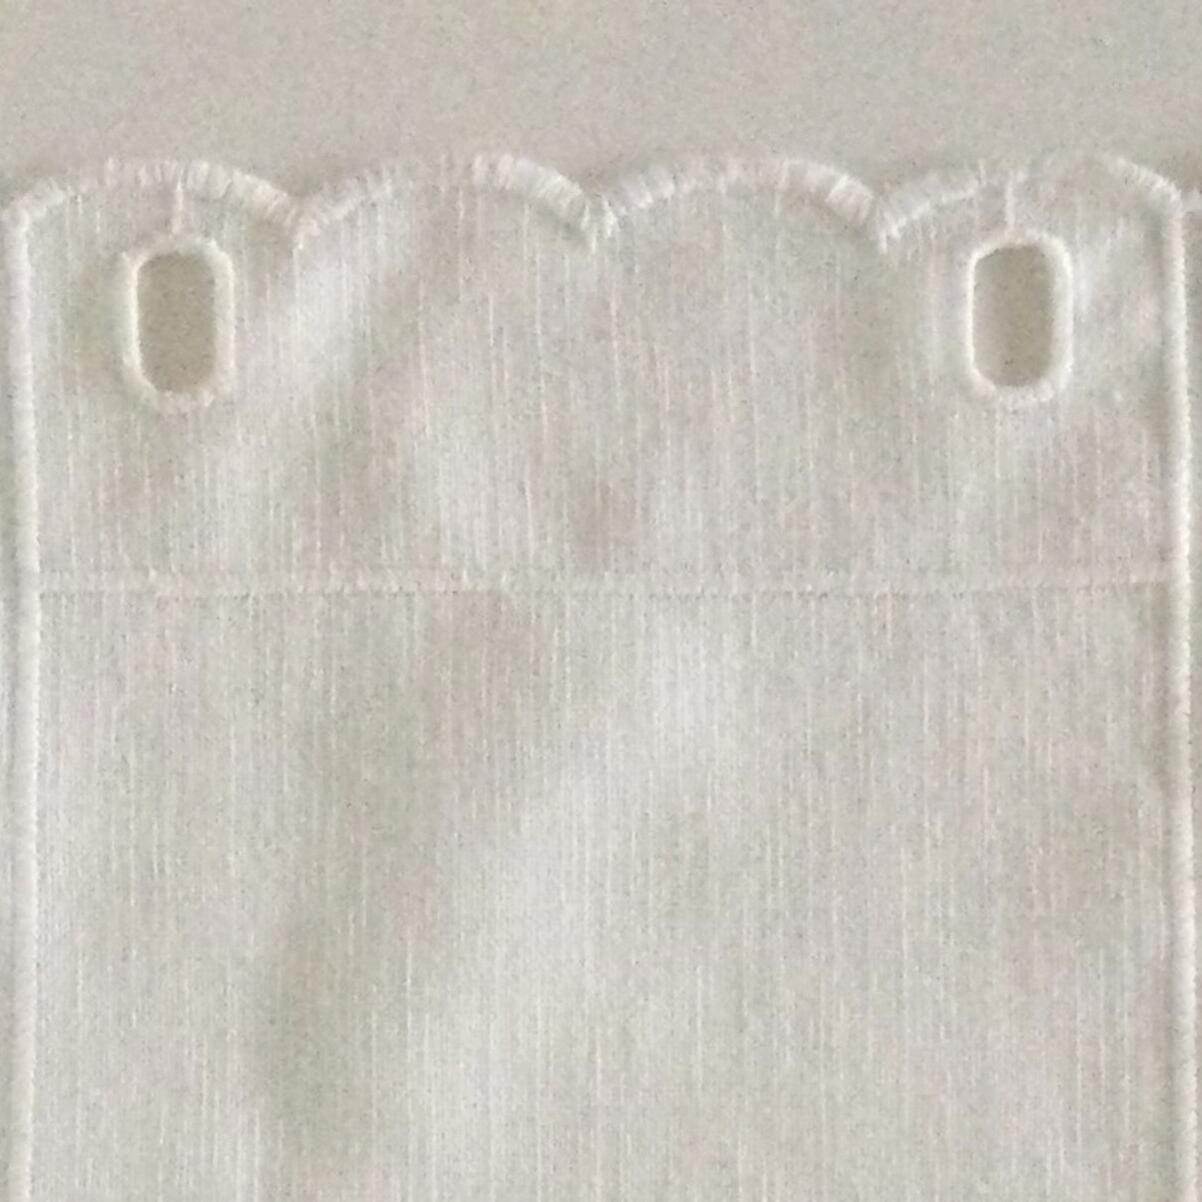 Tessuto al taglio Tirolese bianco 0.01 cm - 4